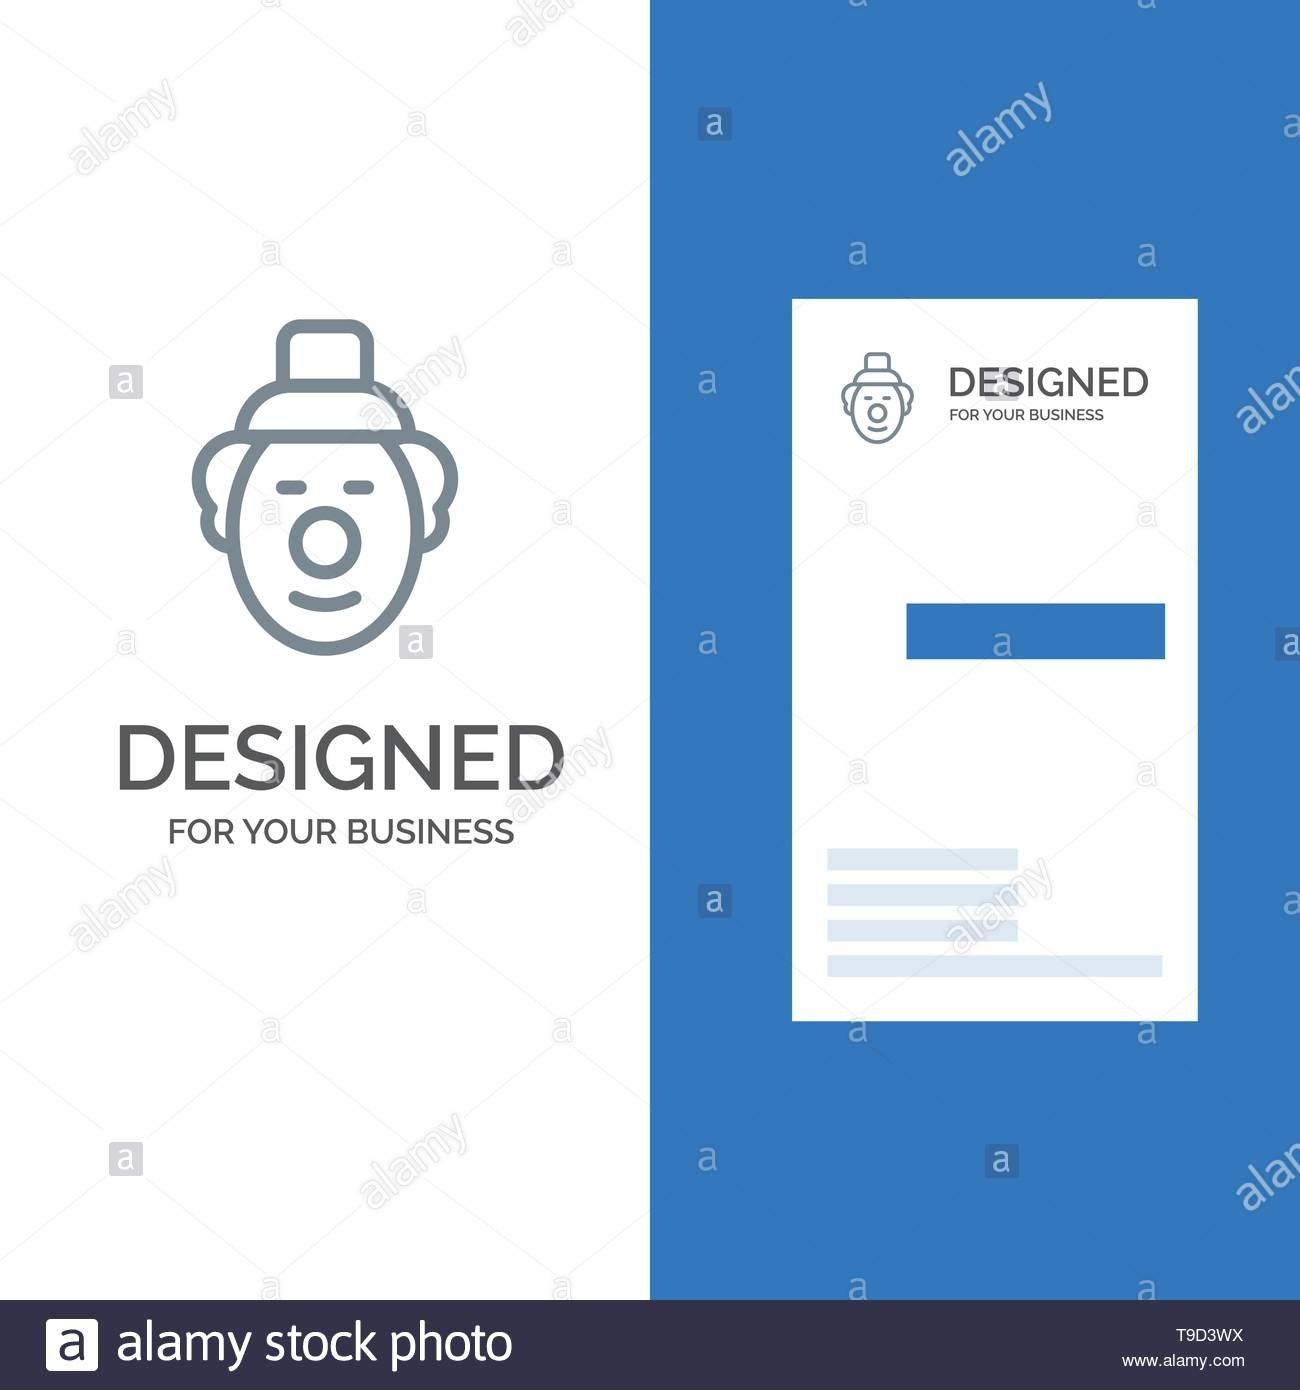 Joker Clown Circus Grey Logo Design And Business Card Template Regarding Joker Card Template